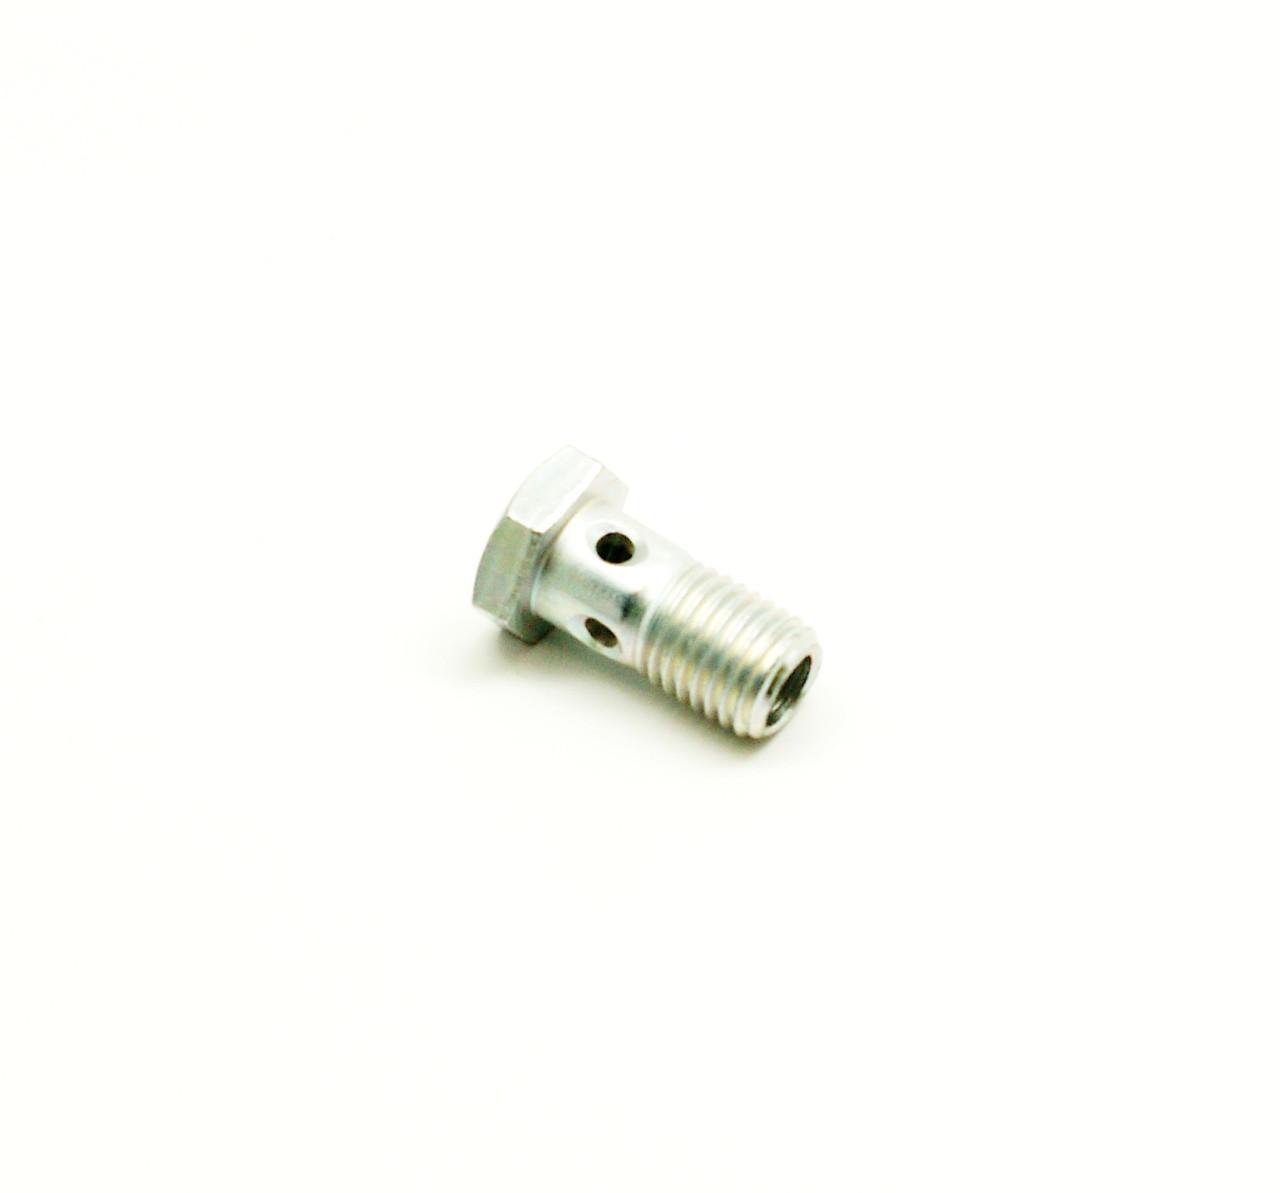 Болт-штуцер топливной трубки (M12 x 1.50 x 24) Cummins B Series